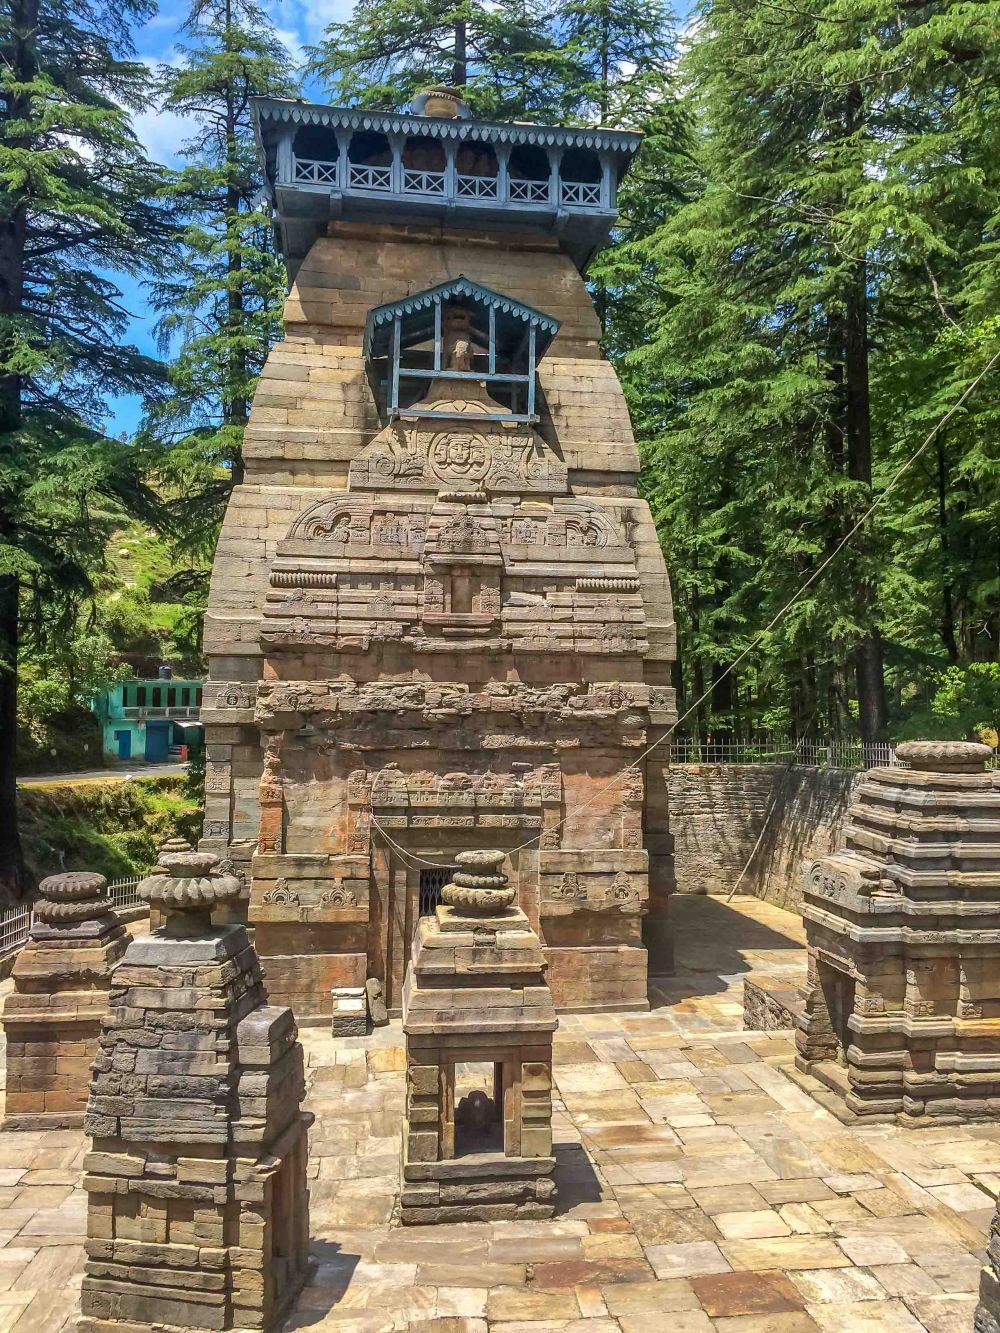 Dundeshwar Temple